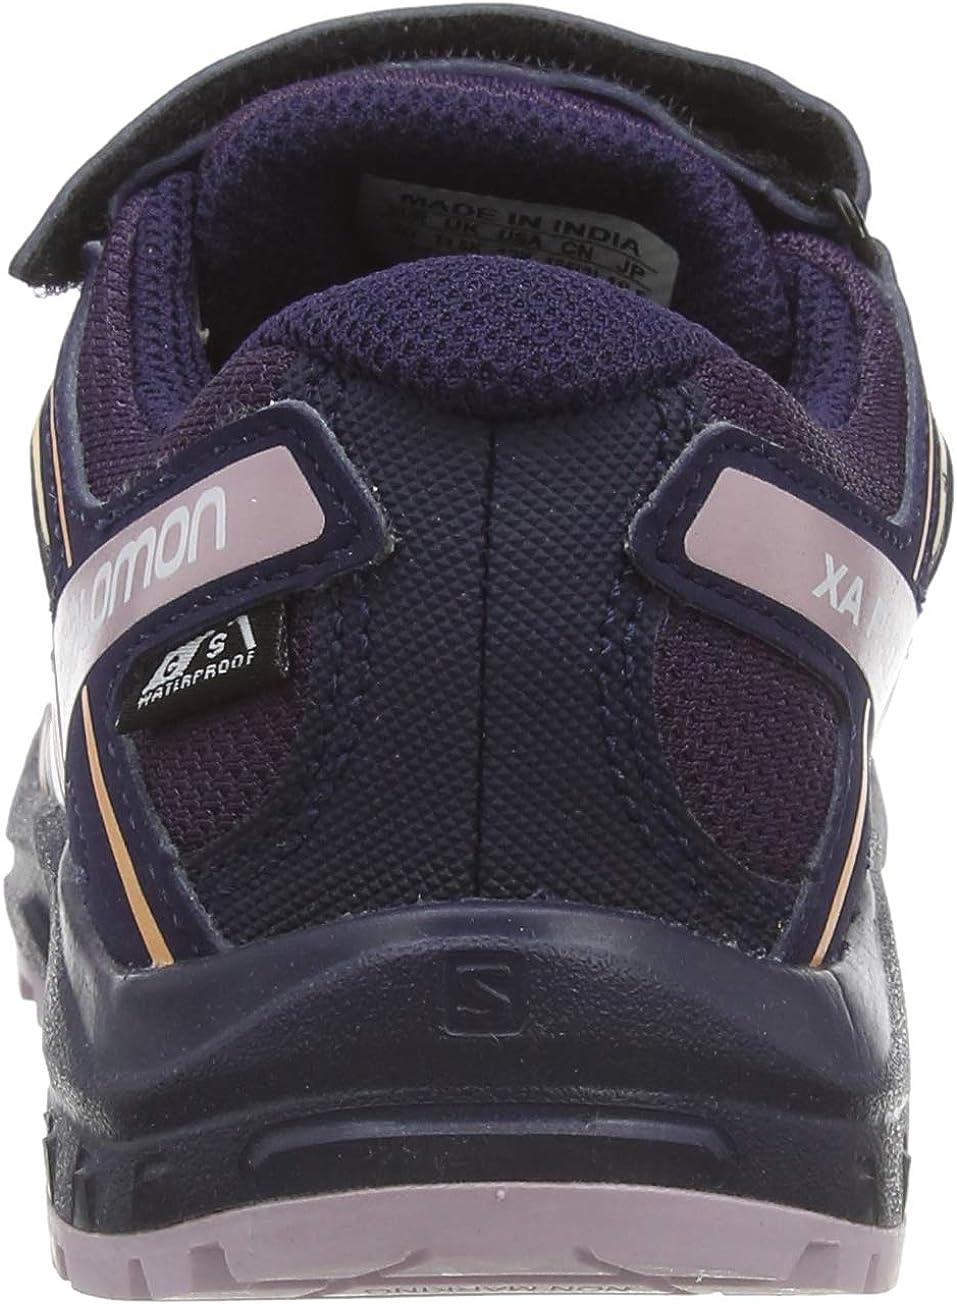 SALOMON Unisex Kids/' Xa Pro 3D CSWP K Trail Running Shoes